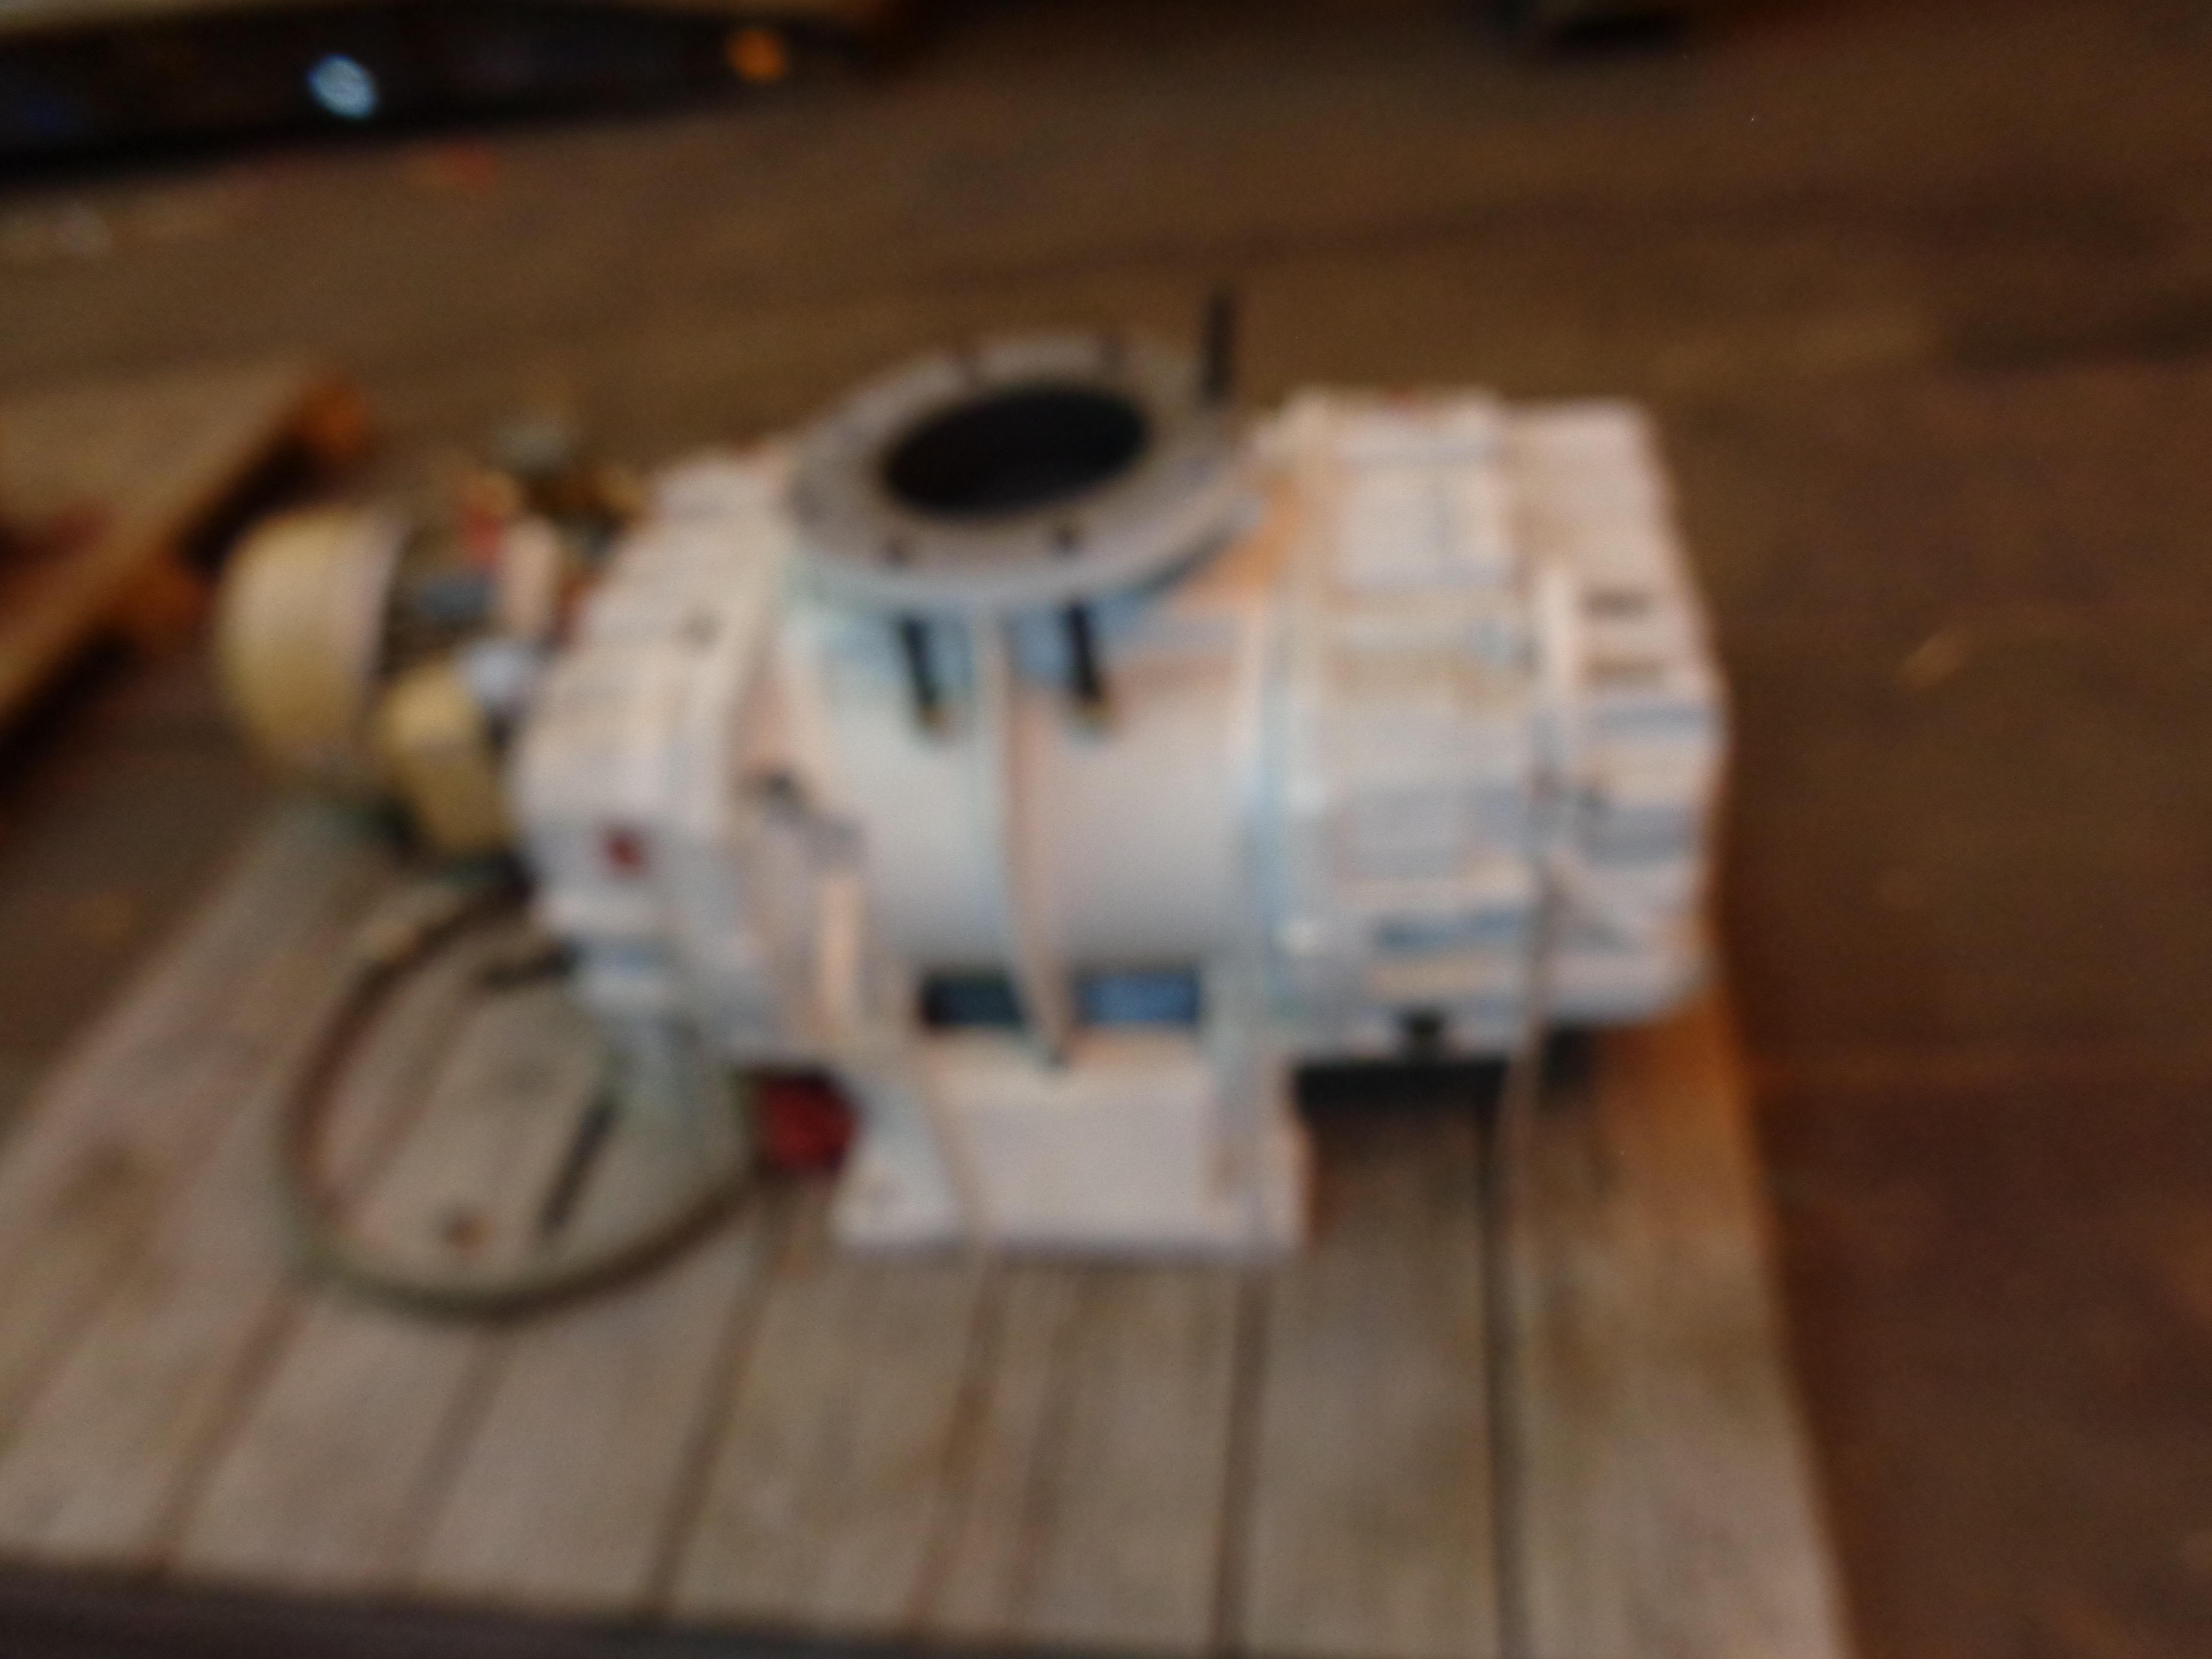 Lot of 3 Vacuum Pumps - Image 20 of 26